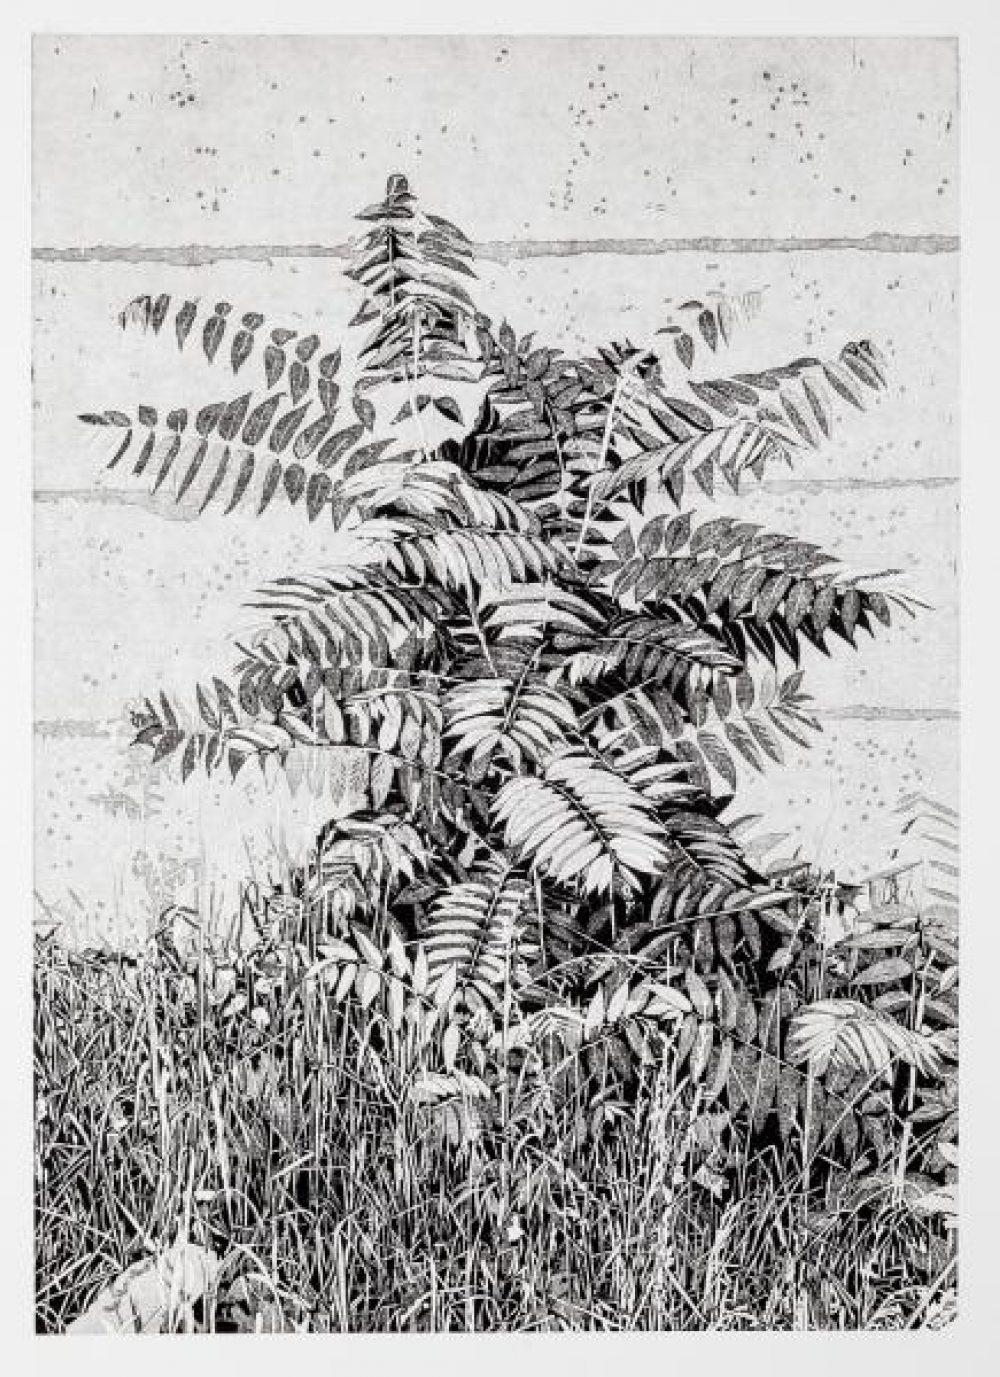 Essigbaum (2017), linocut, 55 x 39 cm (paper: 69 x 52 cm)